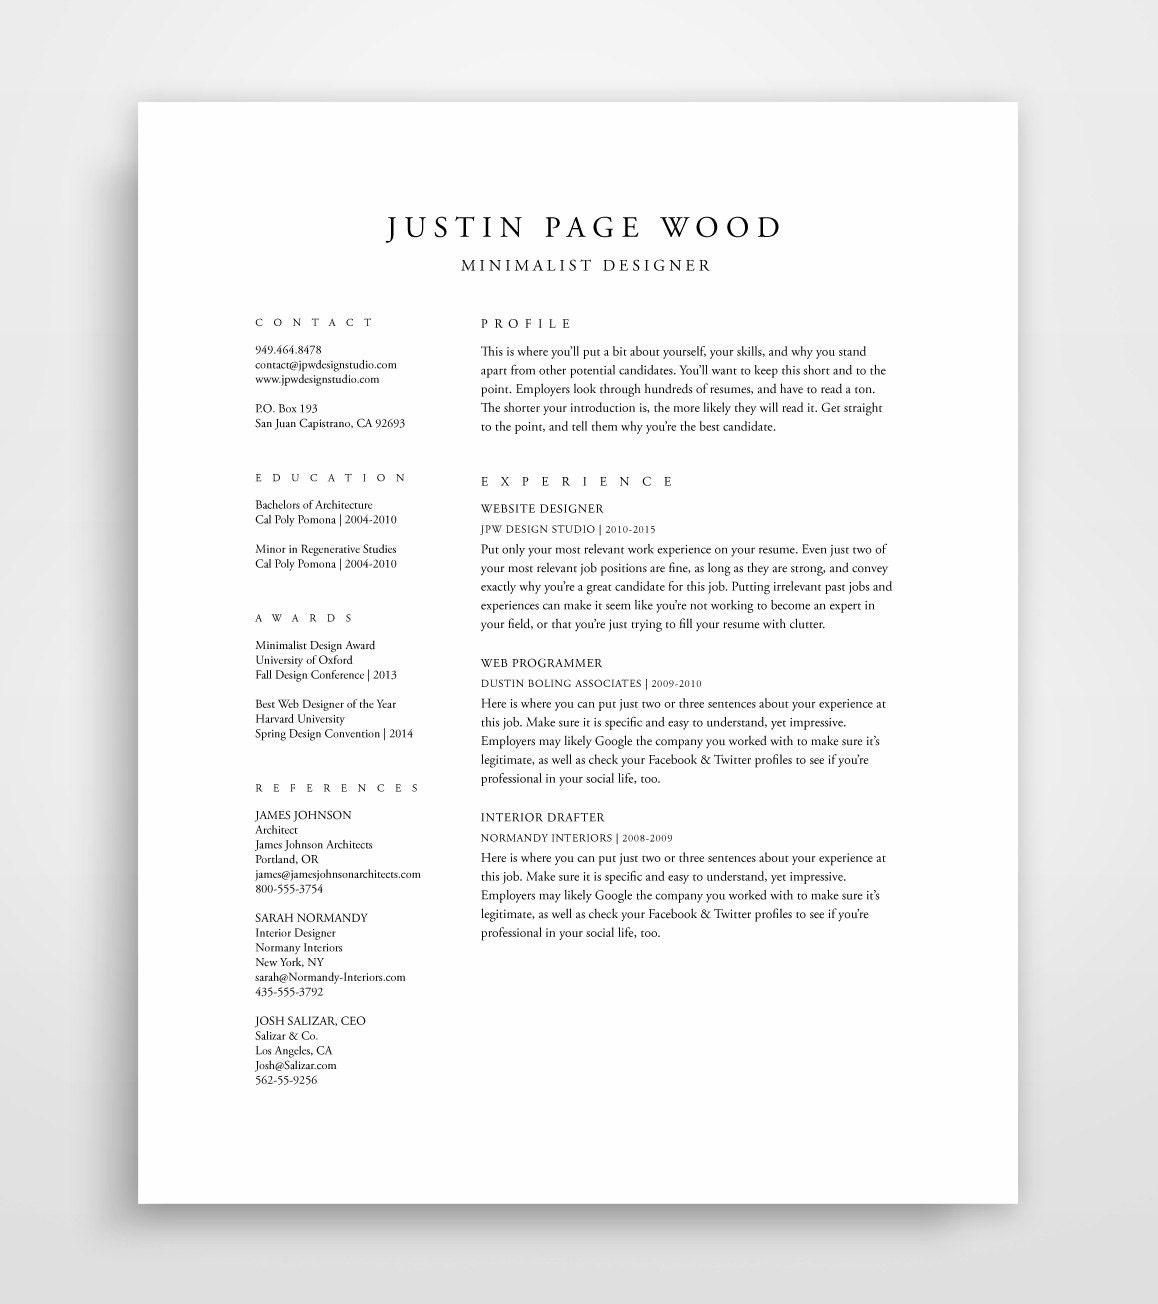 Traditional Resume Template, Elegant Resume, Classic Resume, Traditional  Resume, Professional Template, Clean Resume Design, Elegant Resume